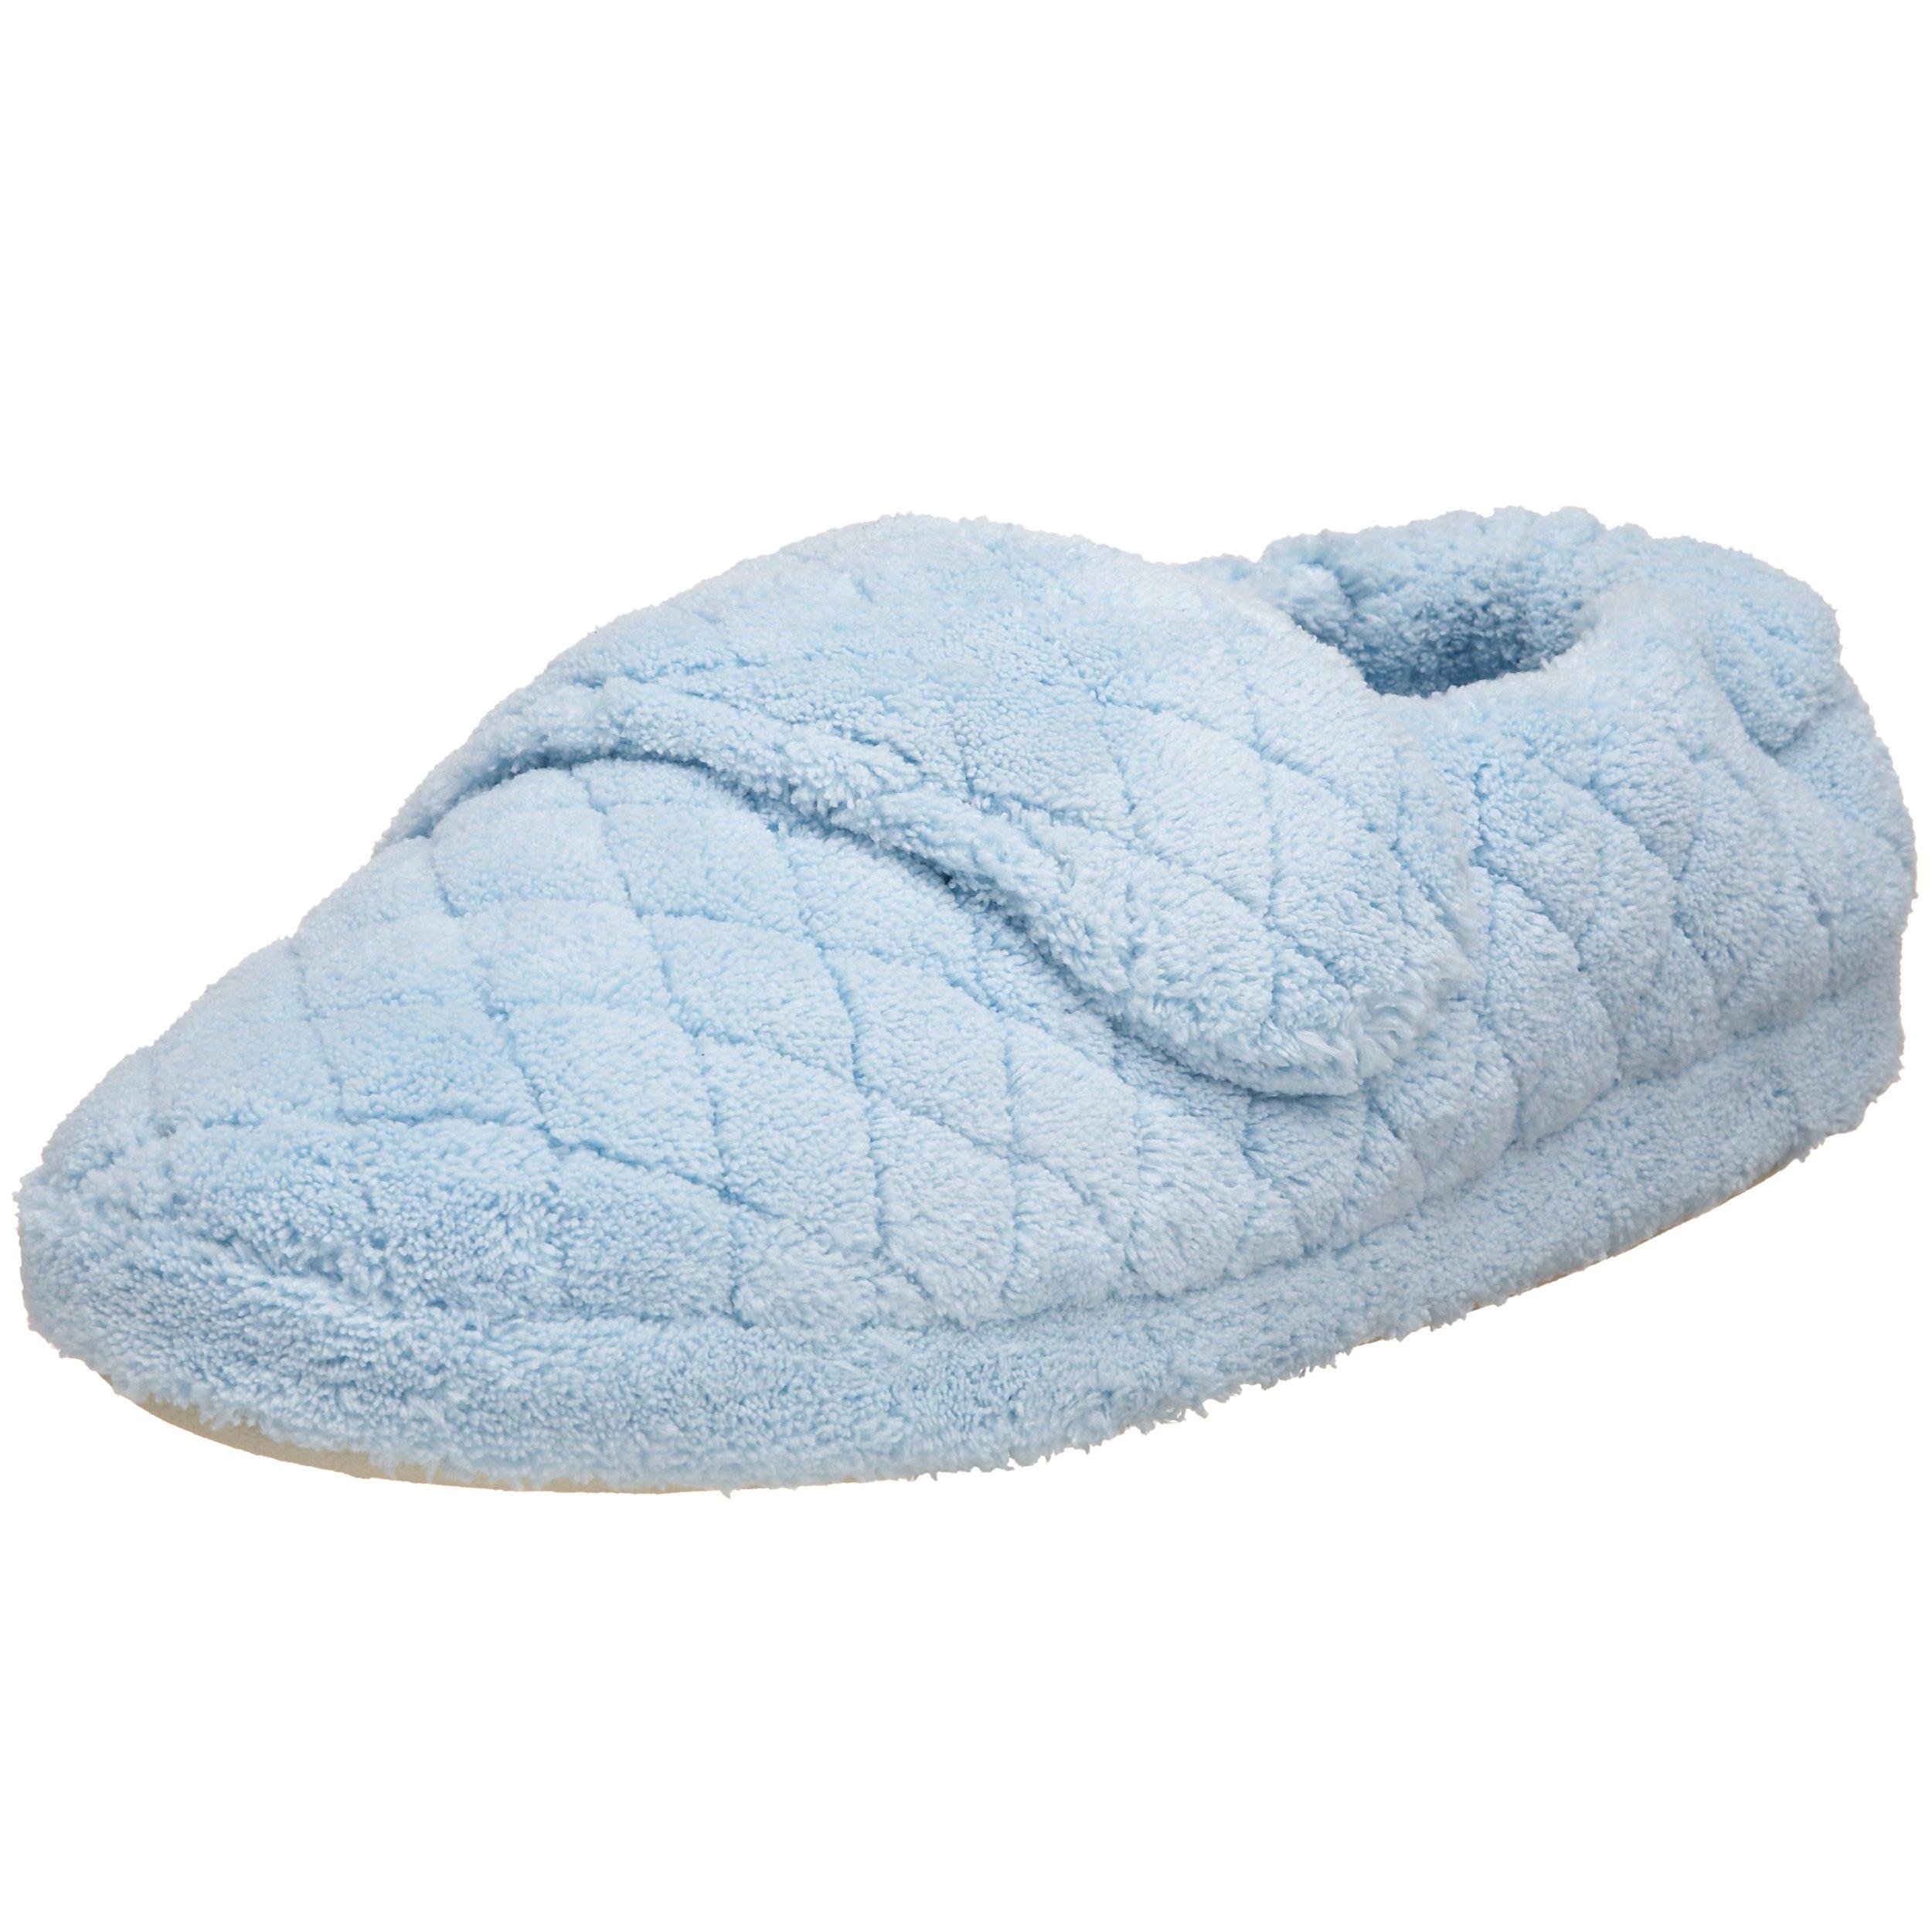 ACORN Women's Spa Wrap Slipper, Powder Blue, 9.5 - 10.5 M US